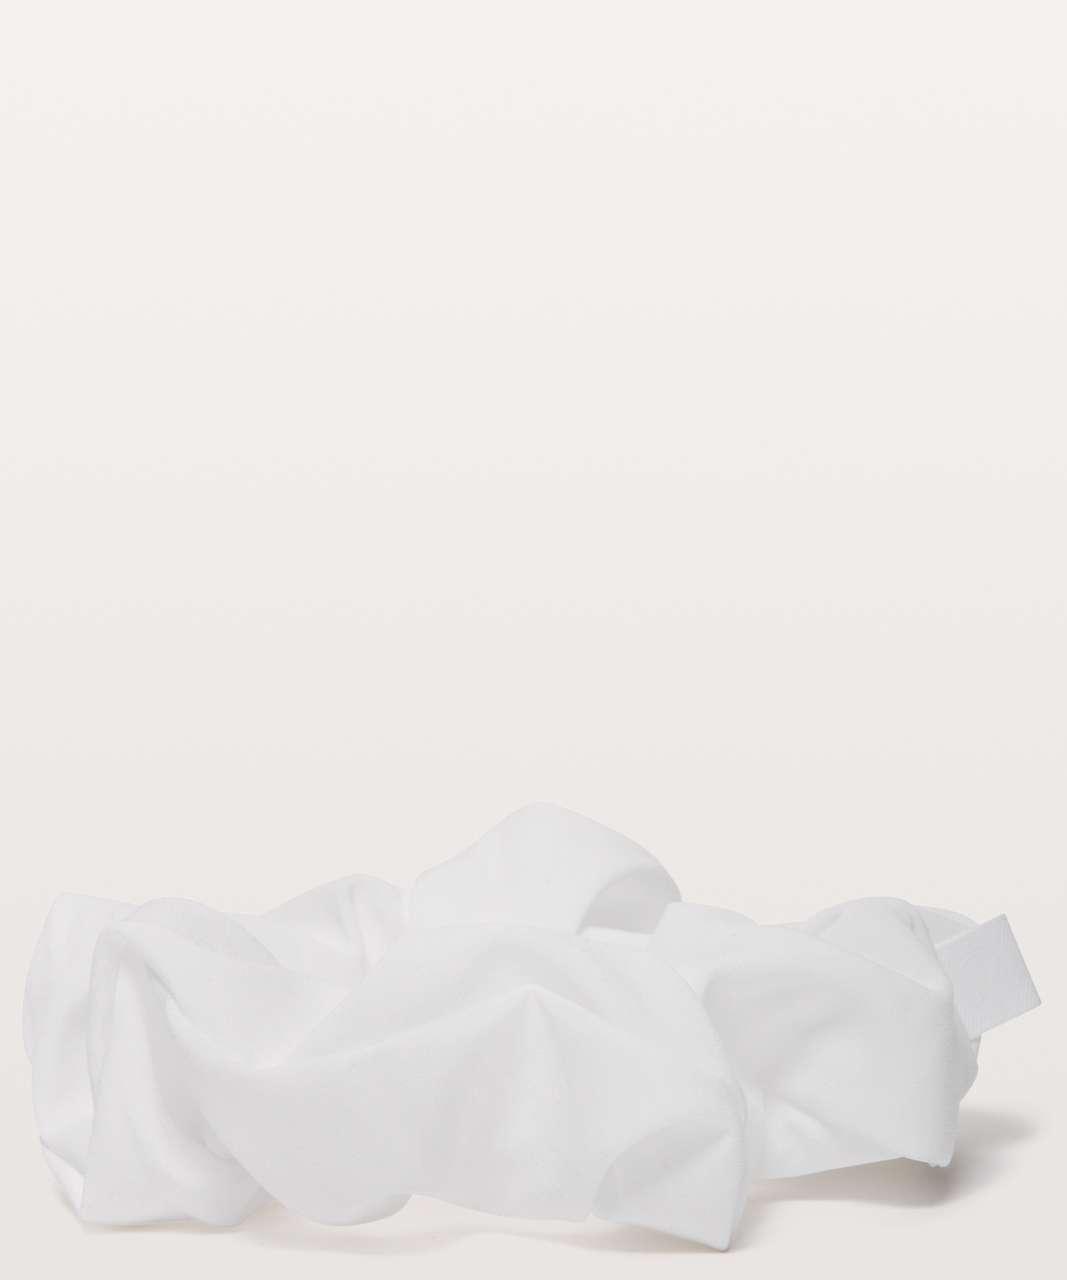 Lululemon Uplifting Scrunchie - White (Third Release)